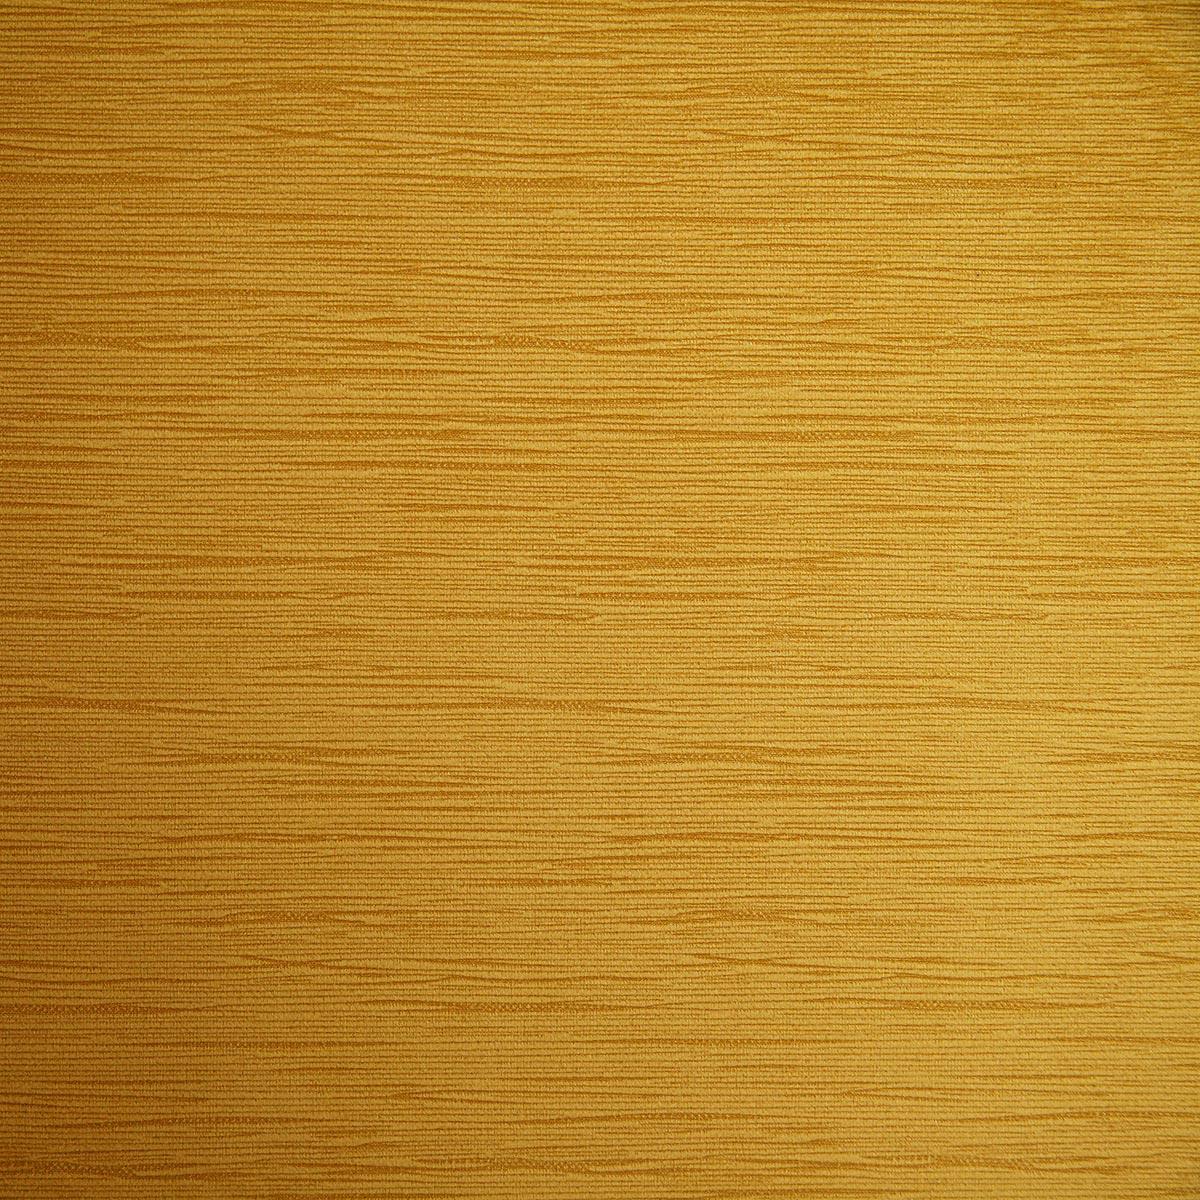 Gold 5847